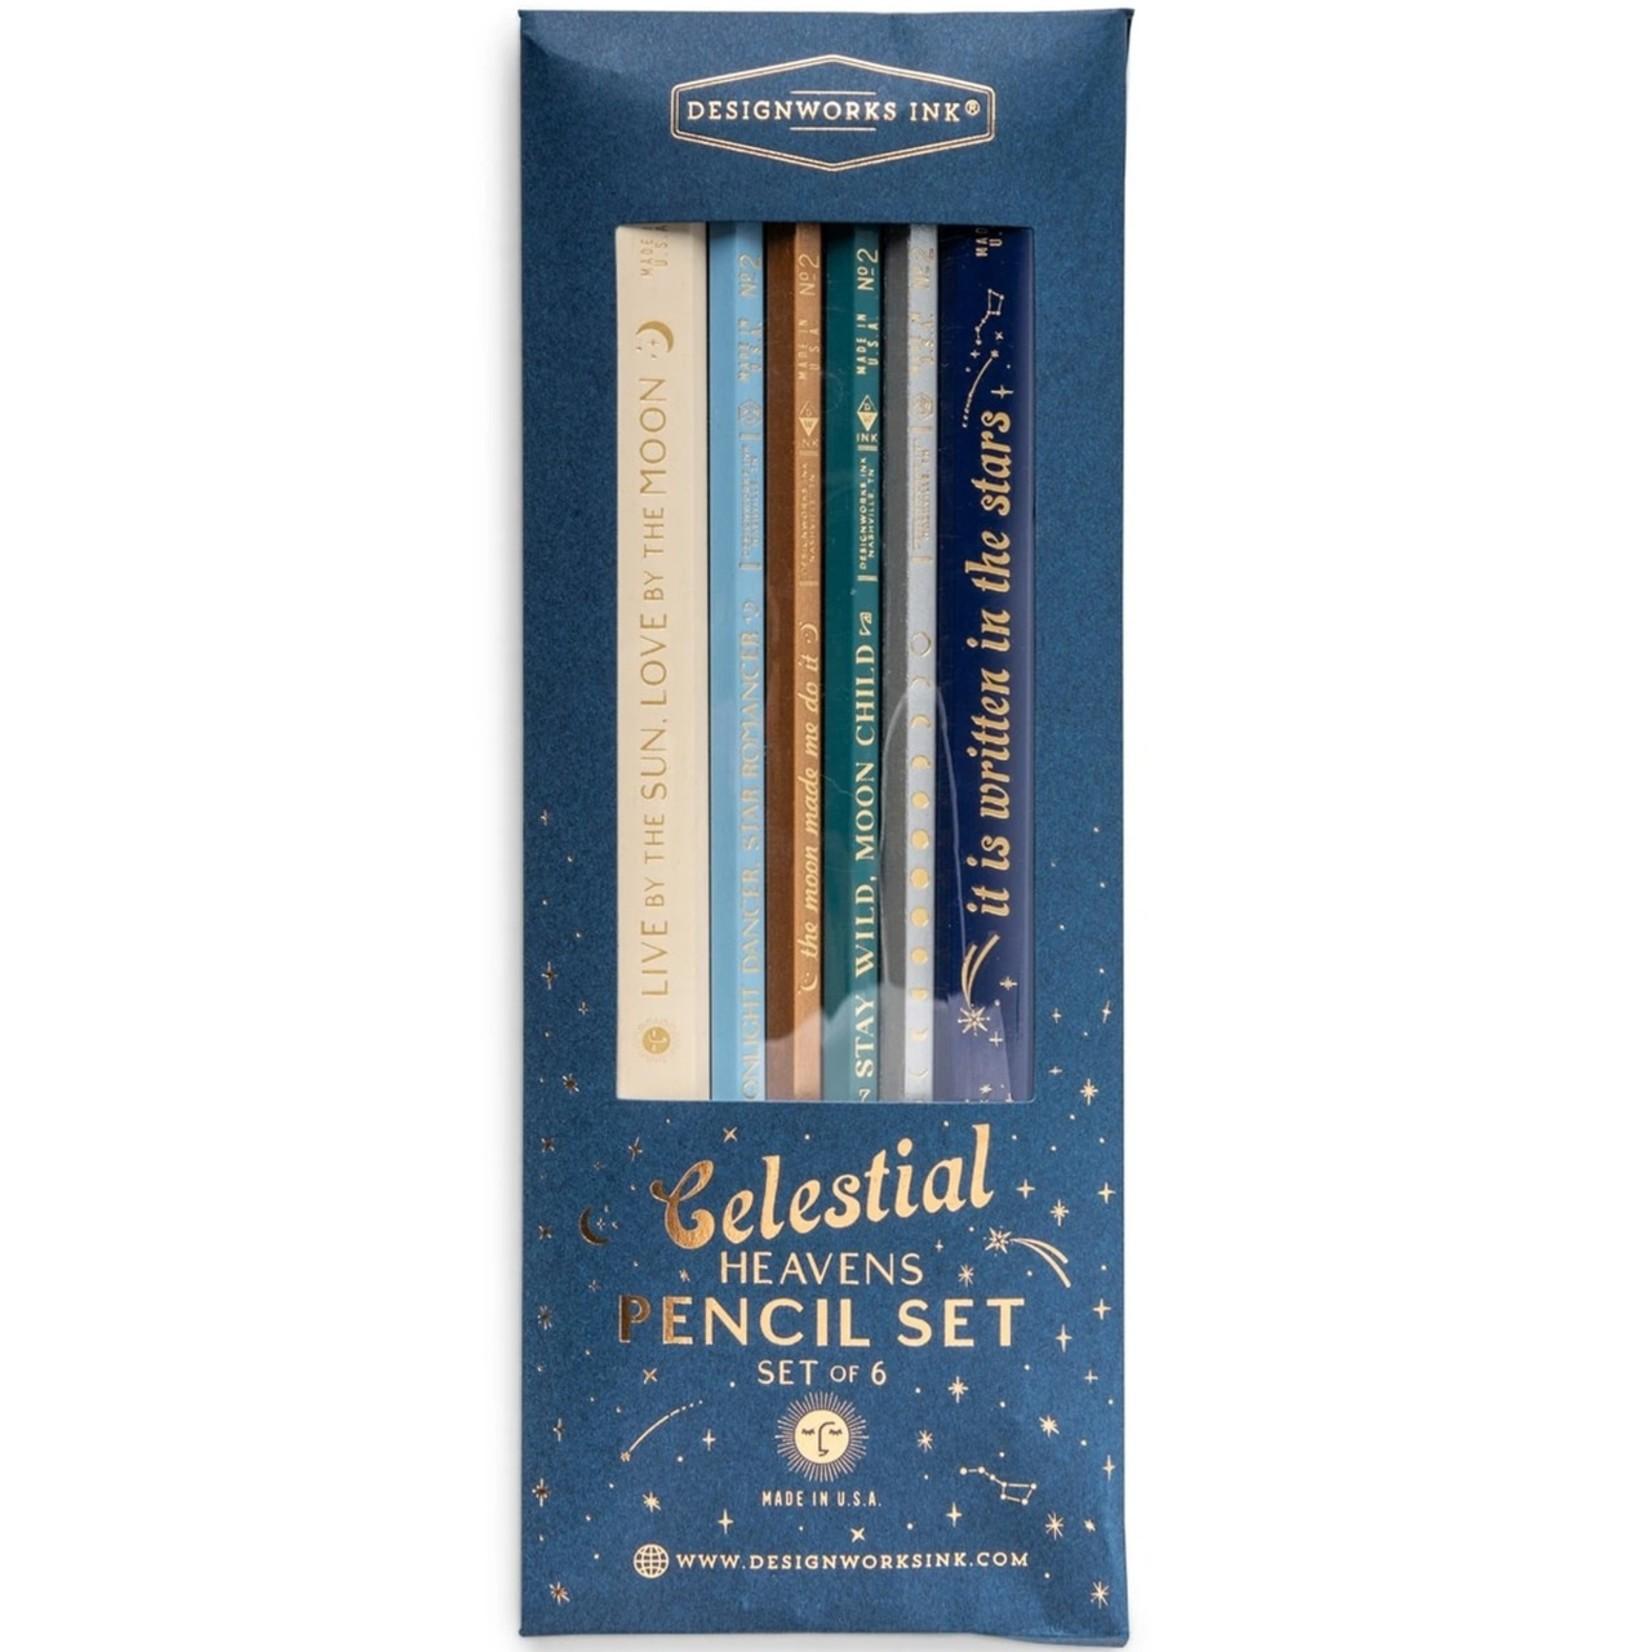 Celestial Heavens Pencil Set